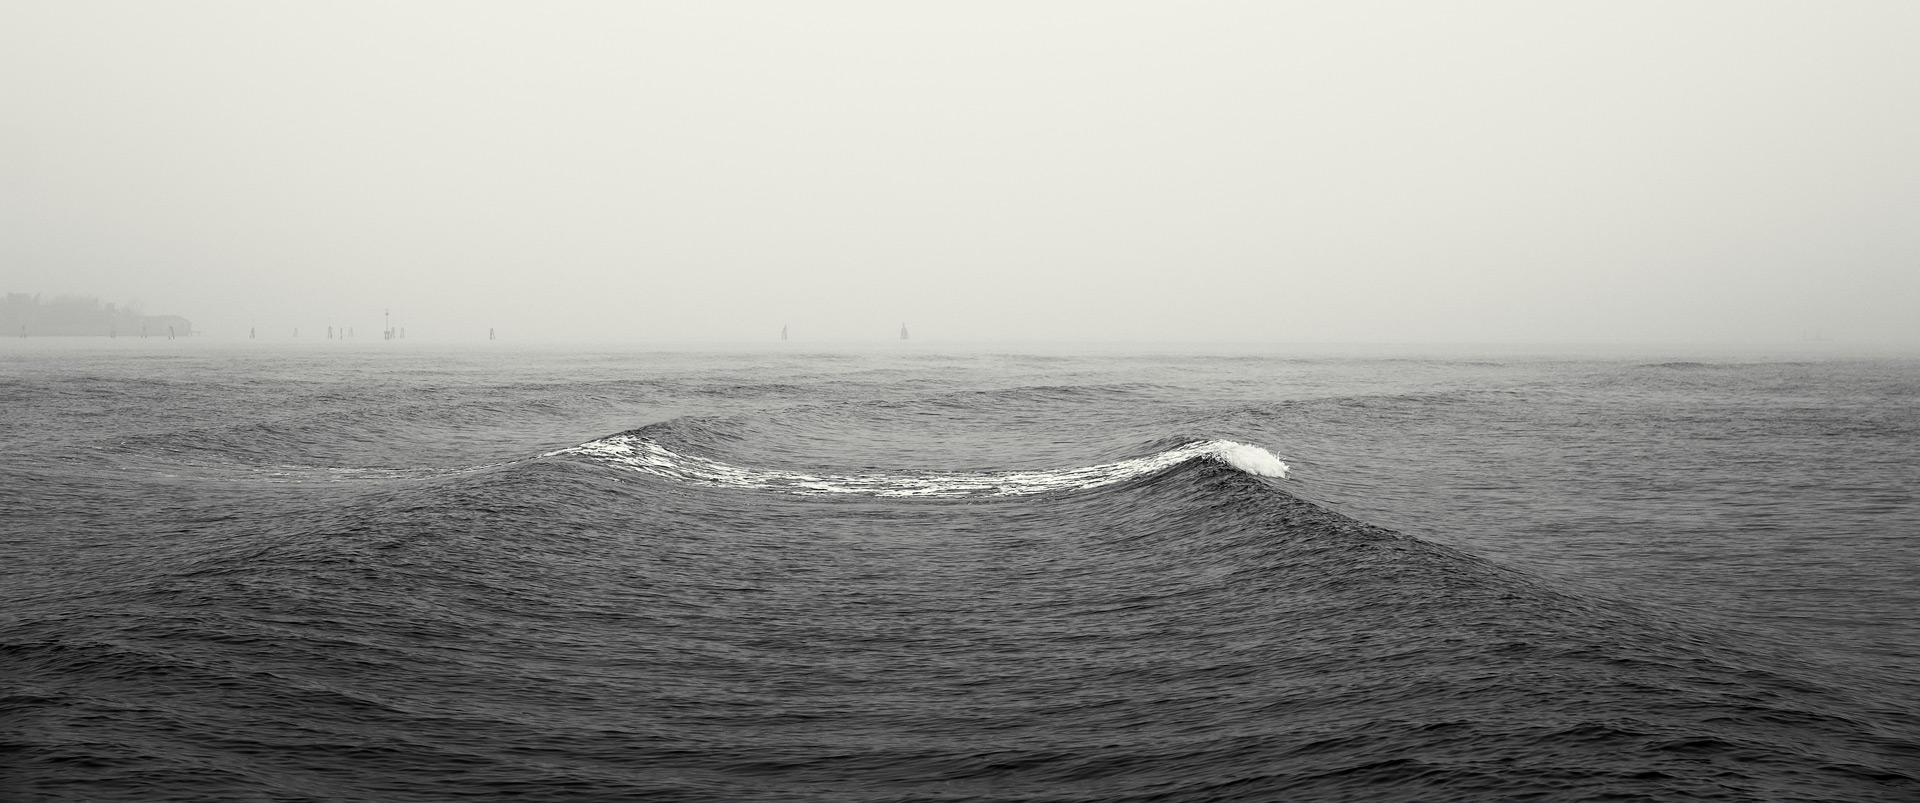 Wake and Waves / Venice Show the Original Fujinon XF 16-55mm f/2.8 Fujifilm X-T2 Black & White [wake and waves f]